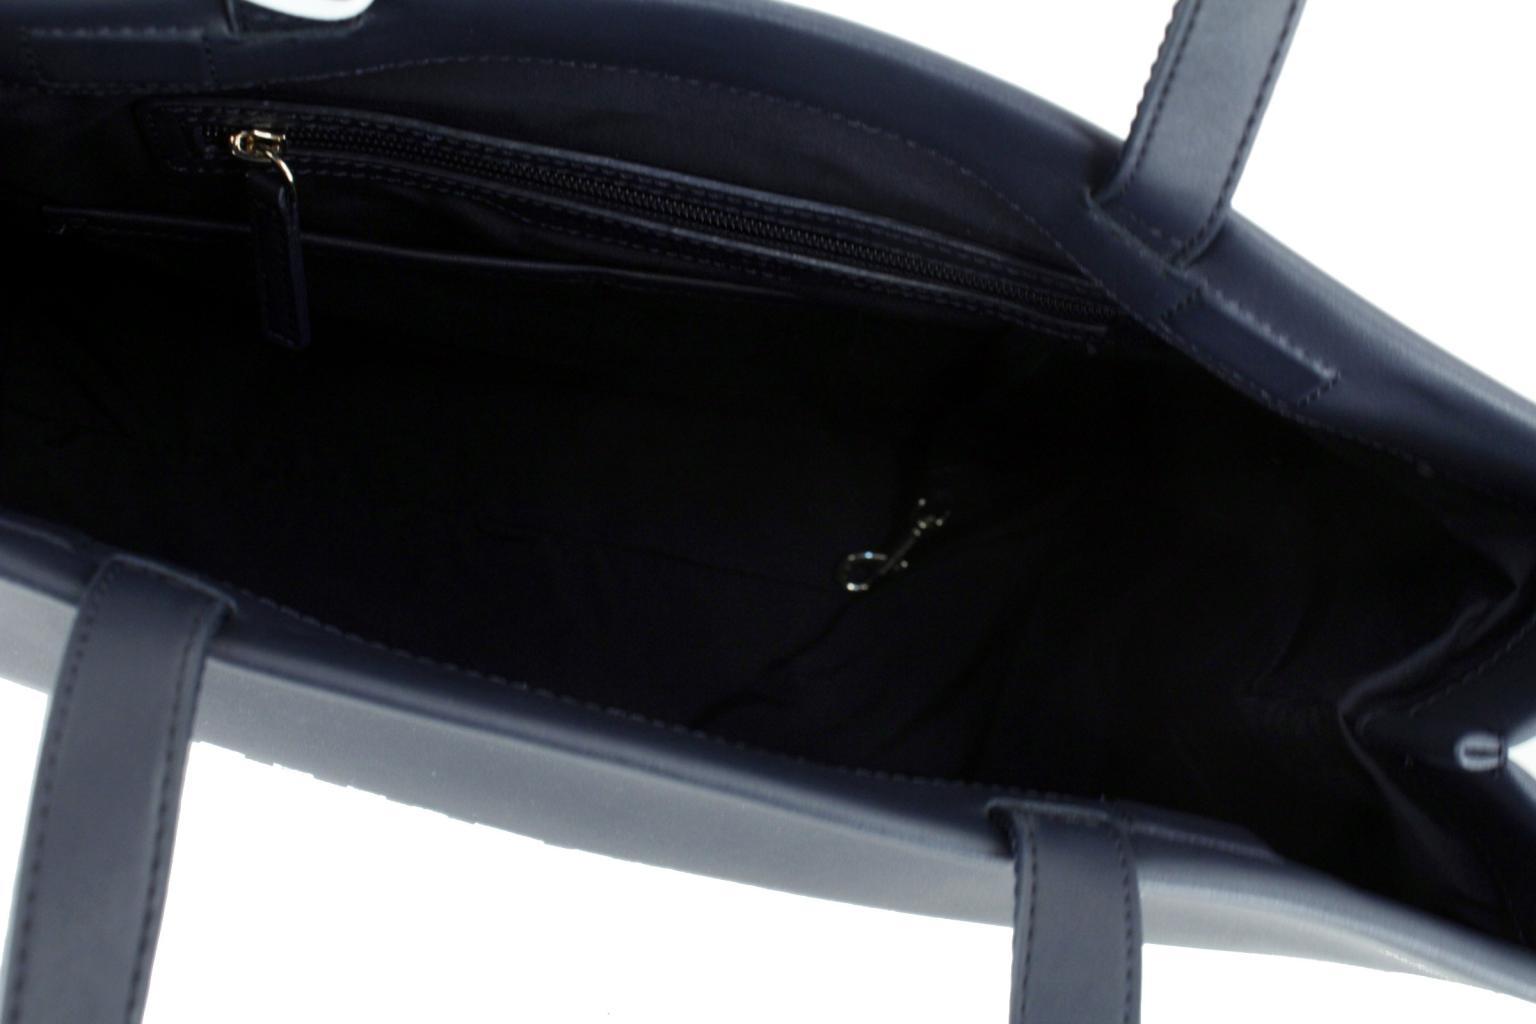 Handtasche dunkelblau Shopper Tote Tommy Hilfiger Sky Captain